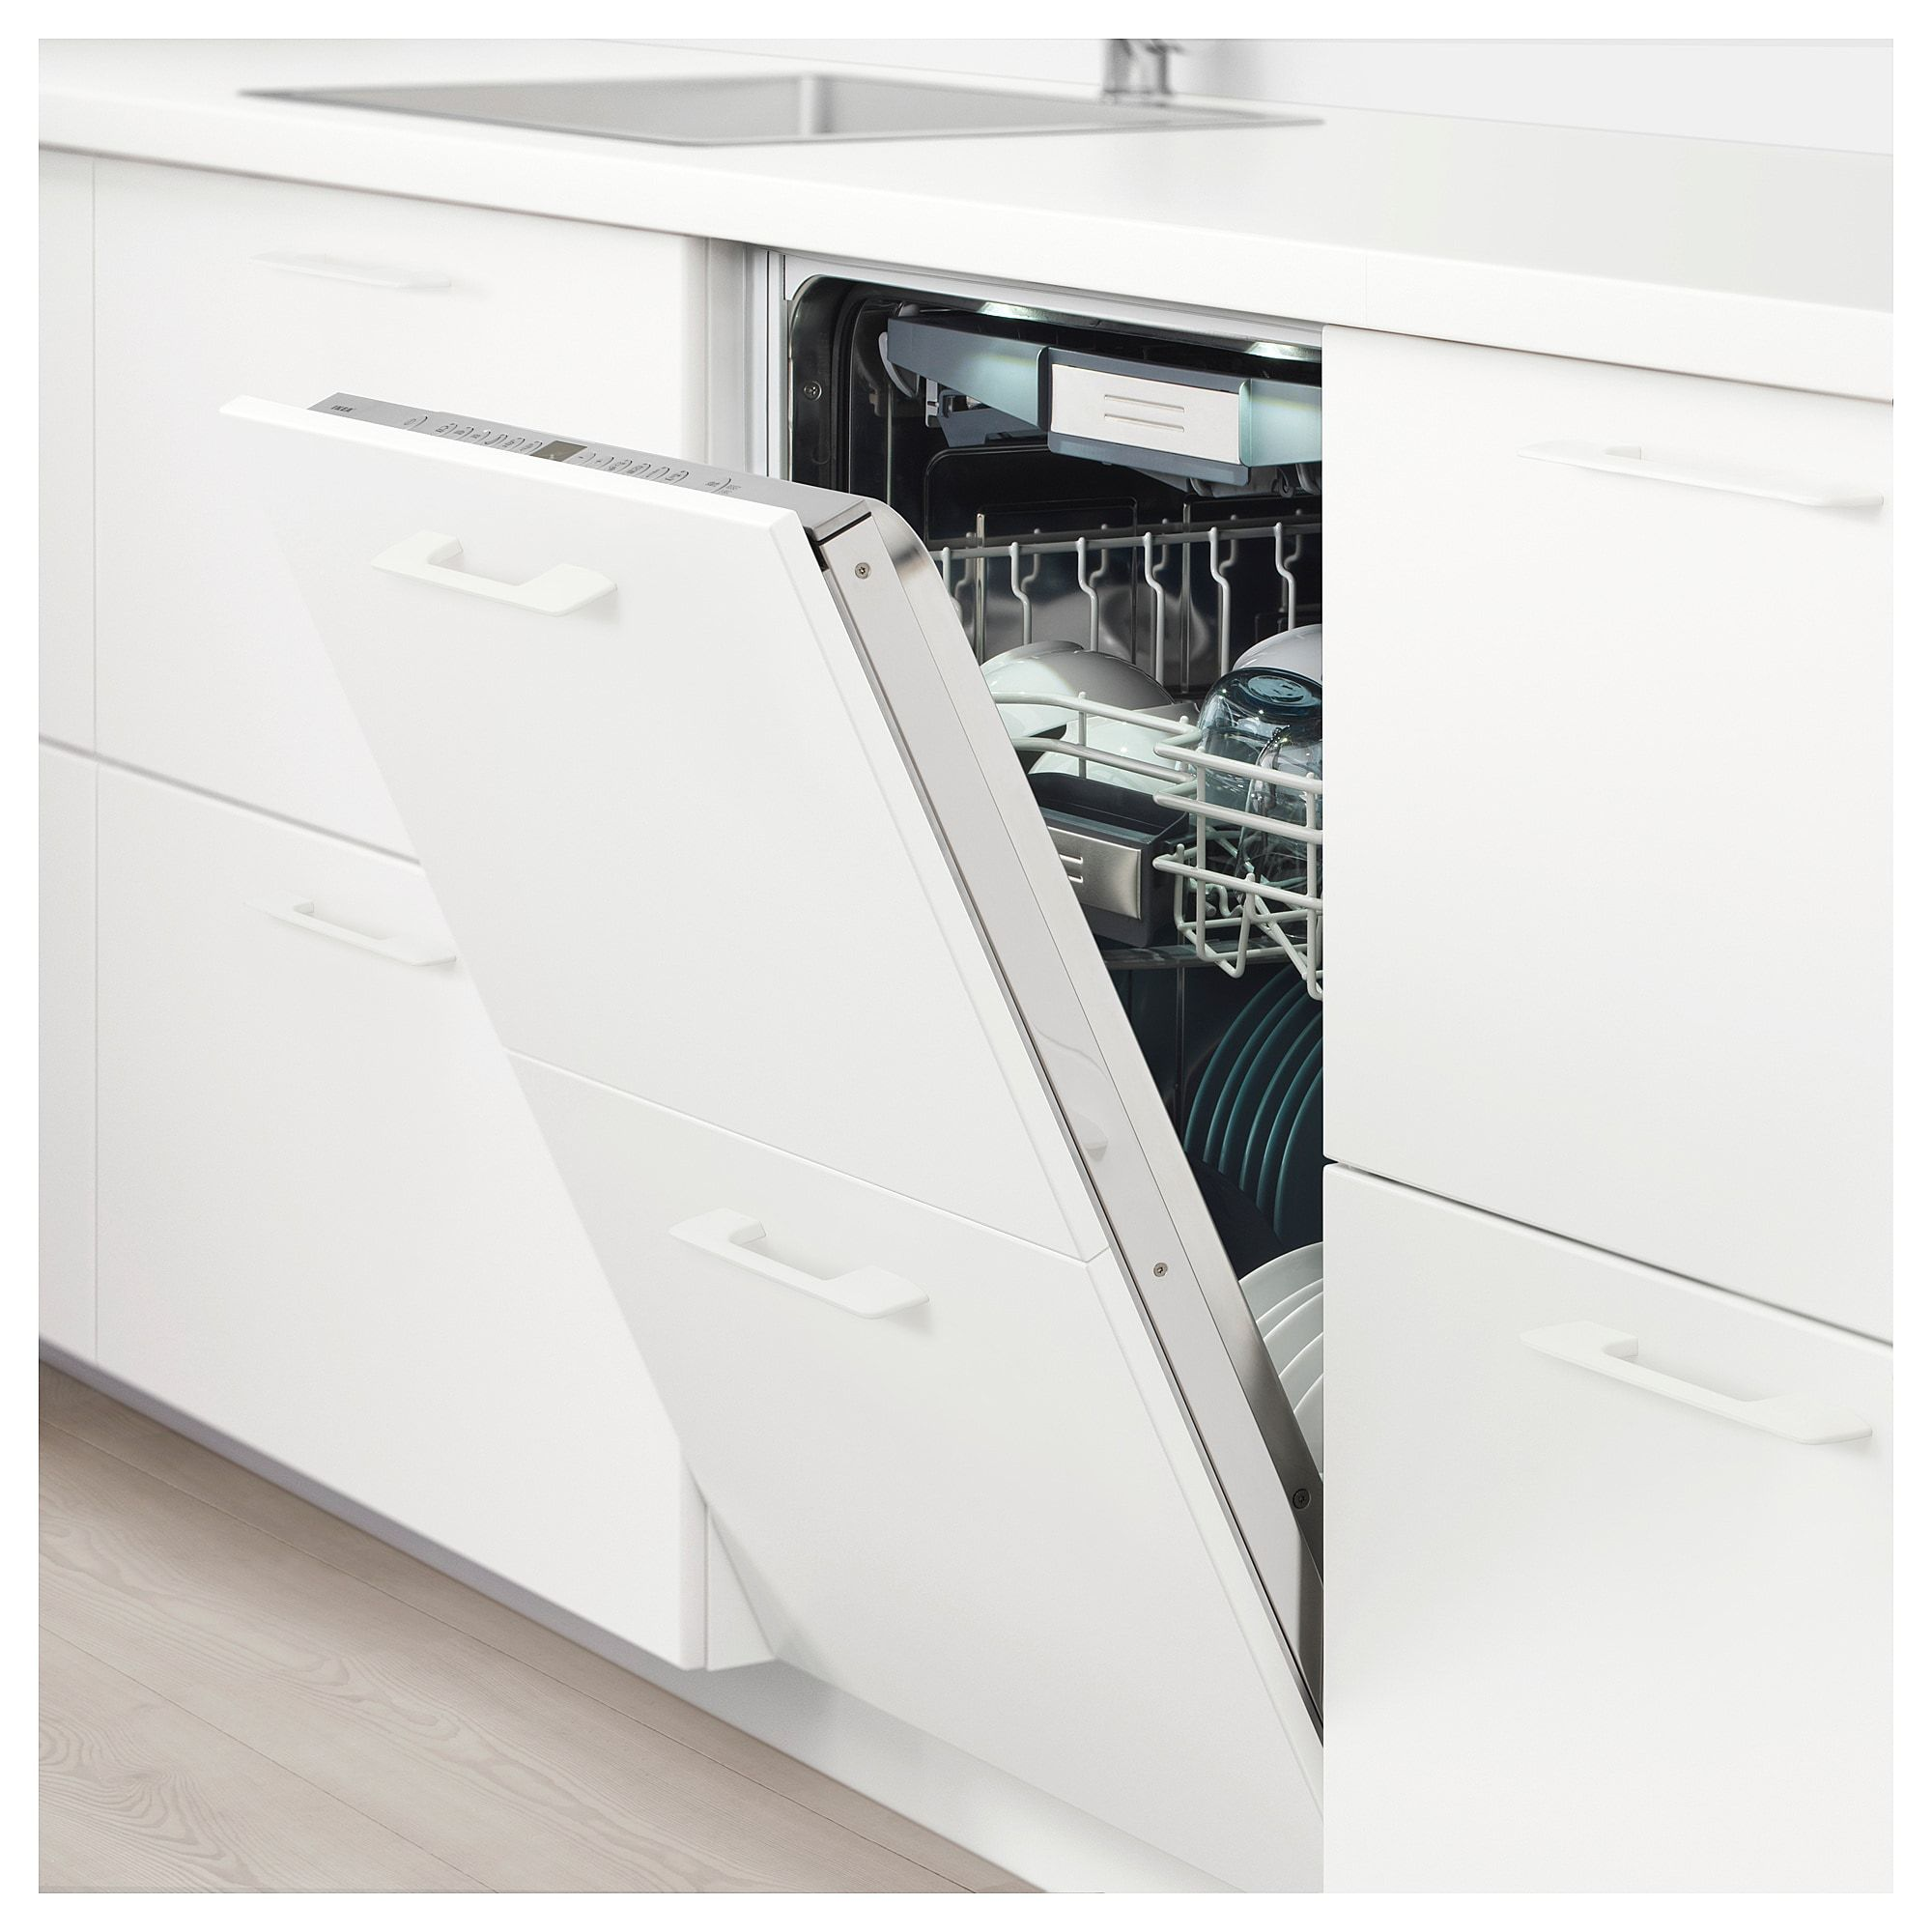 Diskad Geschirrspuler Integr Geschirrspuler Einbaugerate Und Ikea